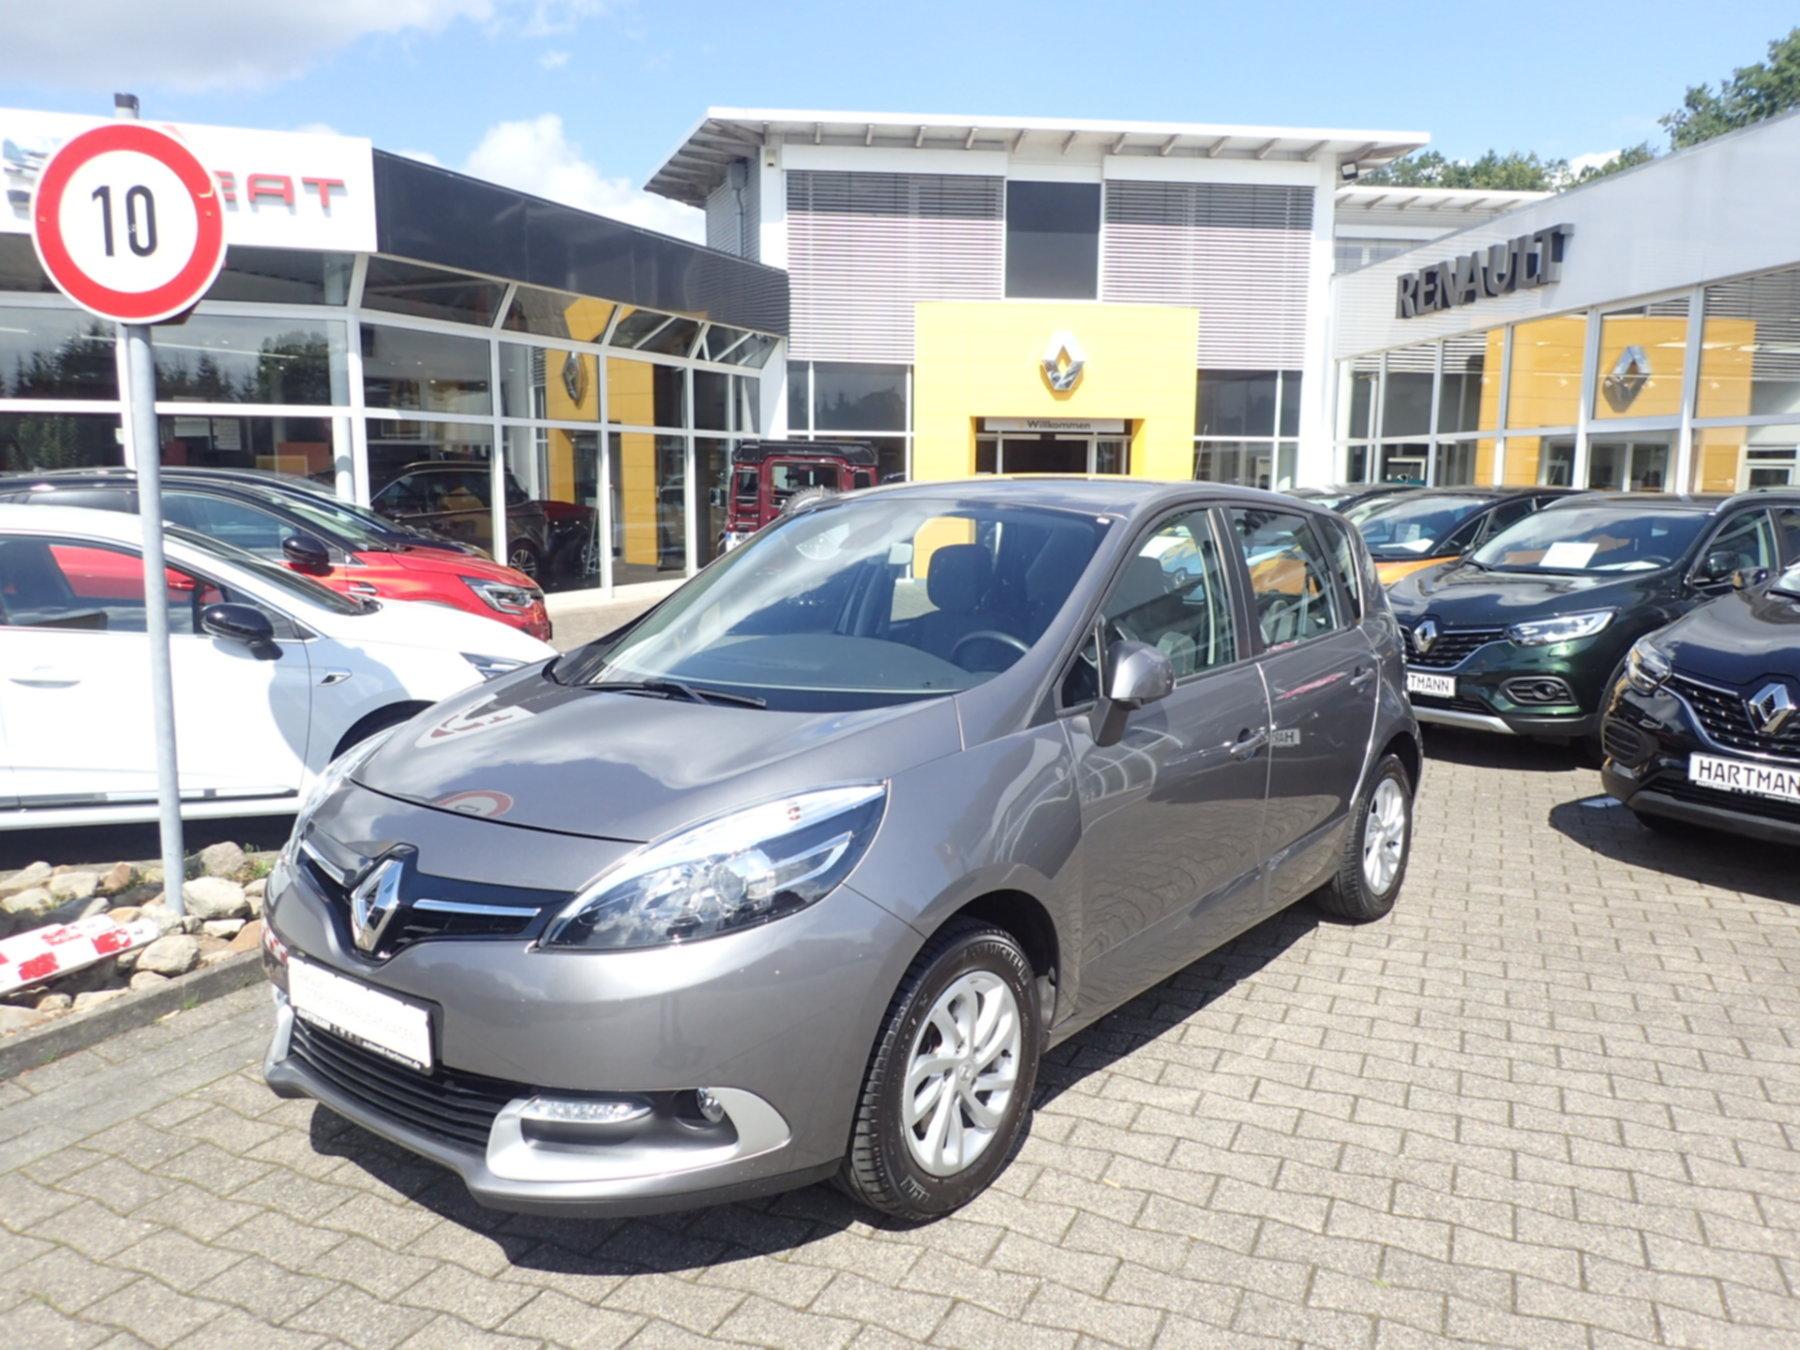 Renault Scenic 1.2 TCe 115 Klima Tempomat Navi, Jahr 2013, Benzin